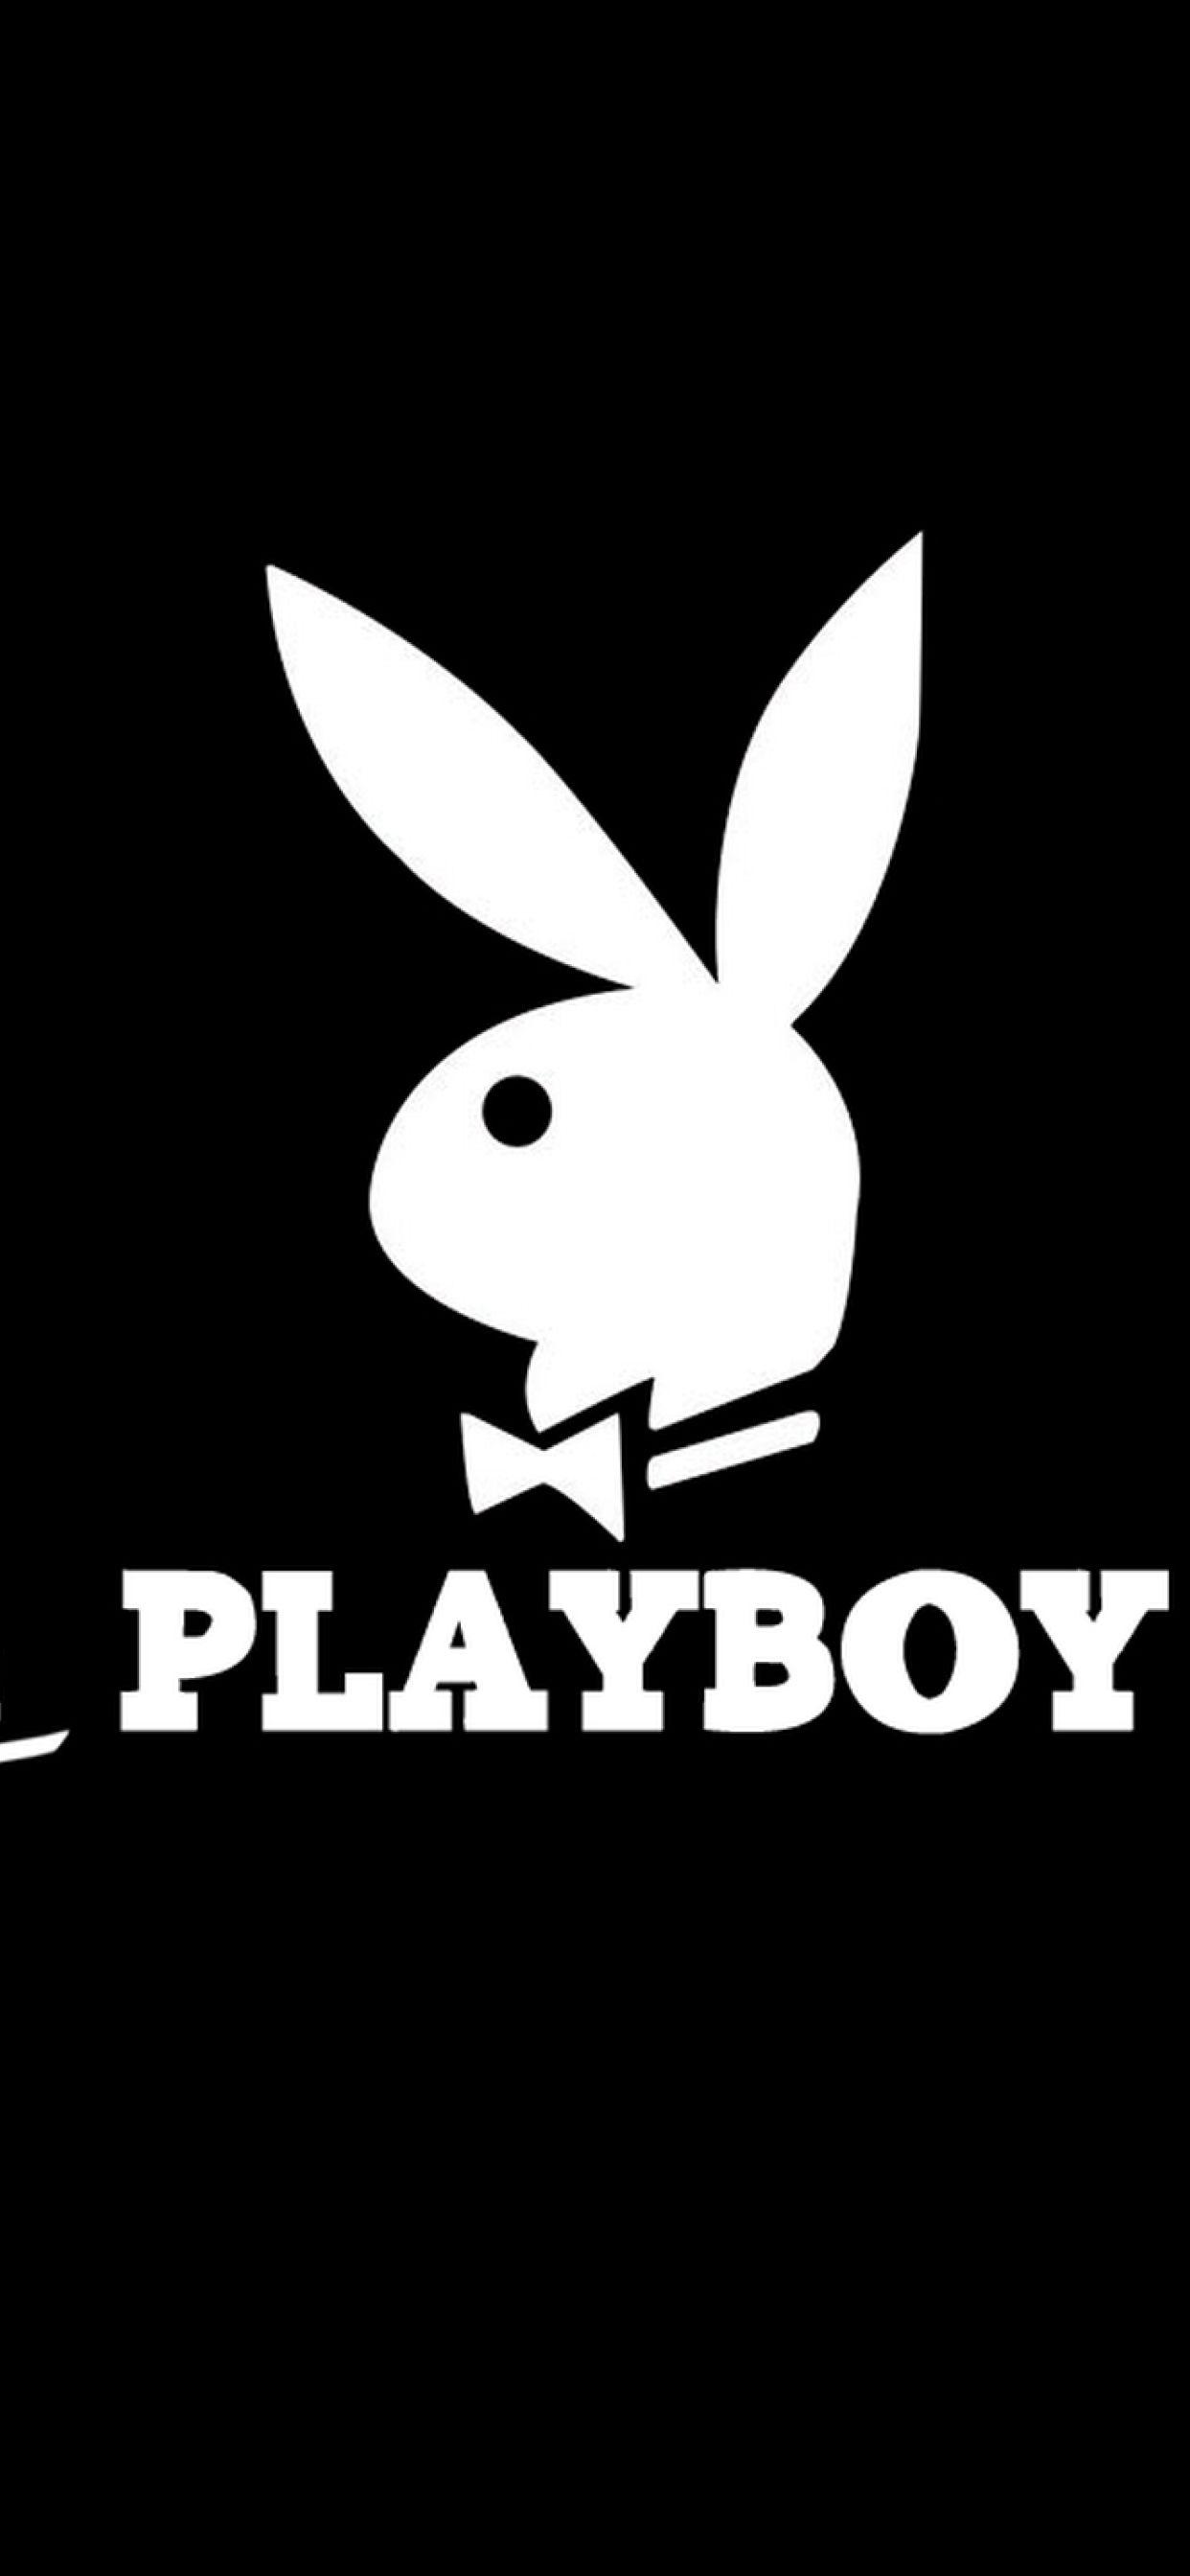 Playboy Logo Background : playboy, background, Playboy, Wallpaper